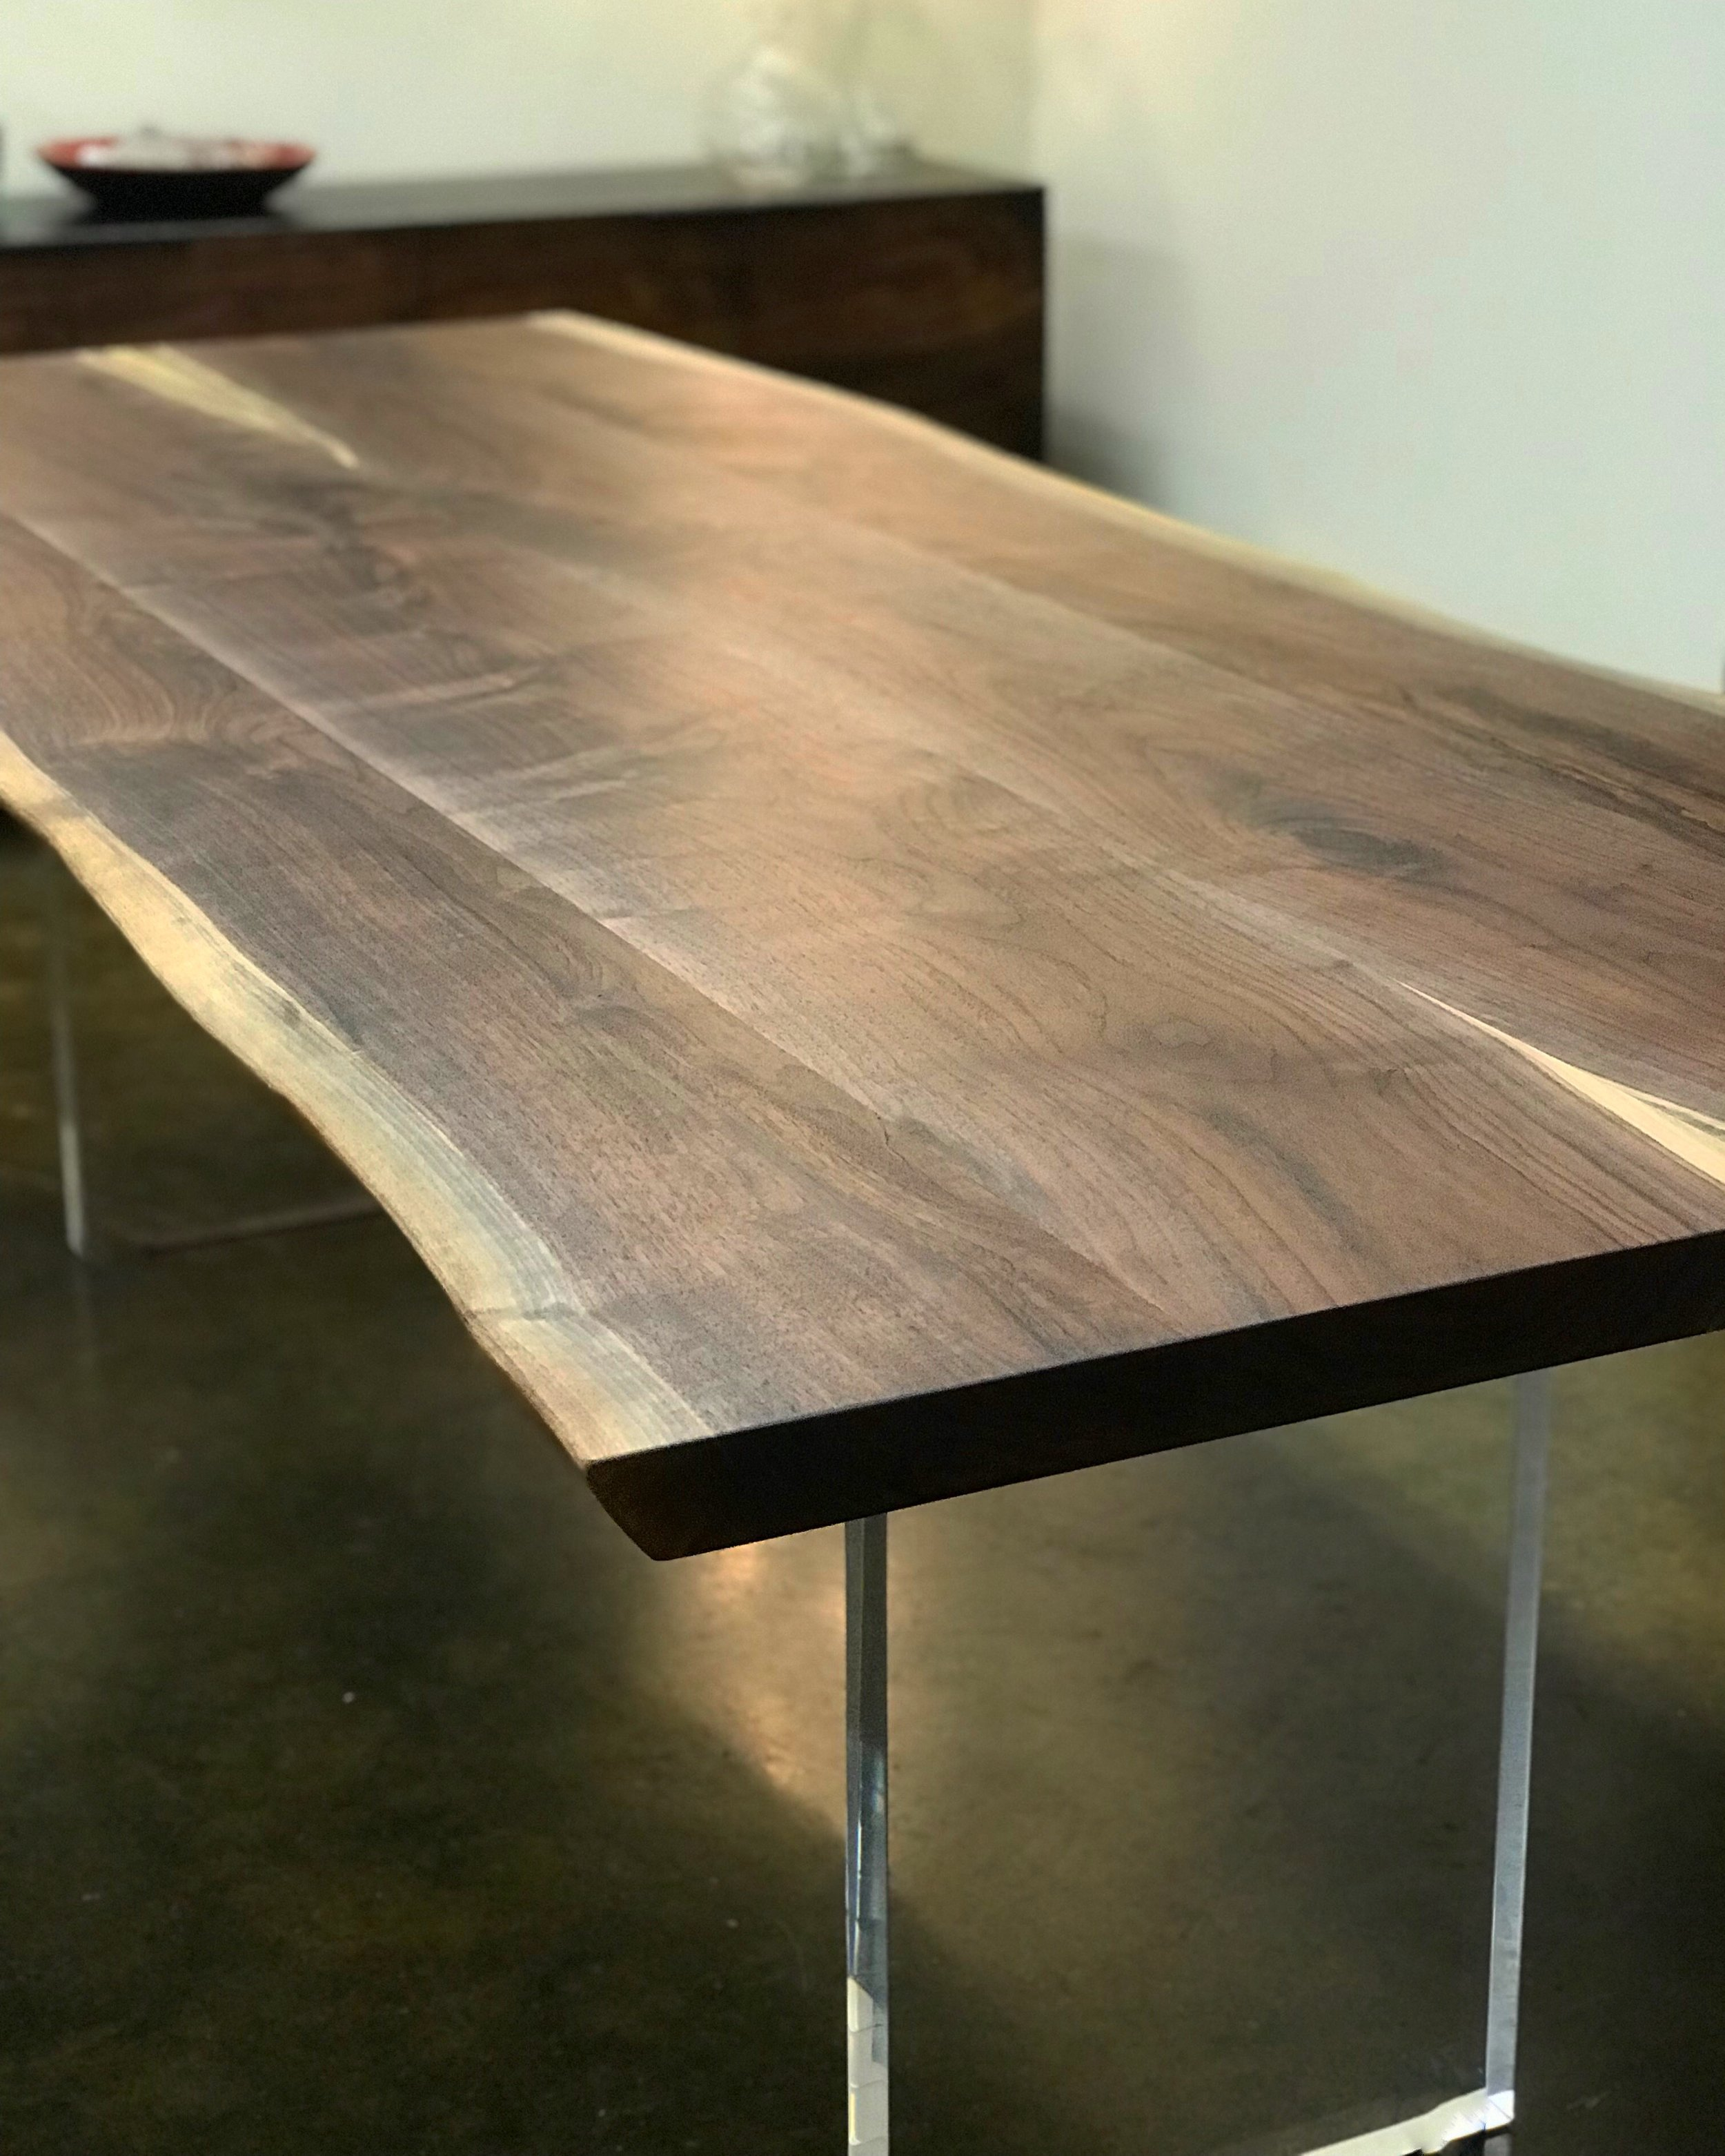 josh-utsey-design-live-edge-walnut-acrylic-custom-furniture-charlotte-nc.jpg